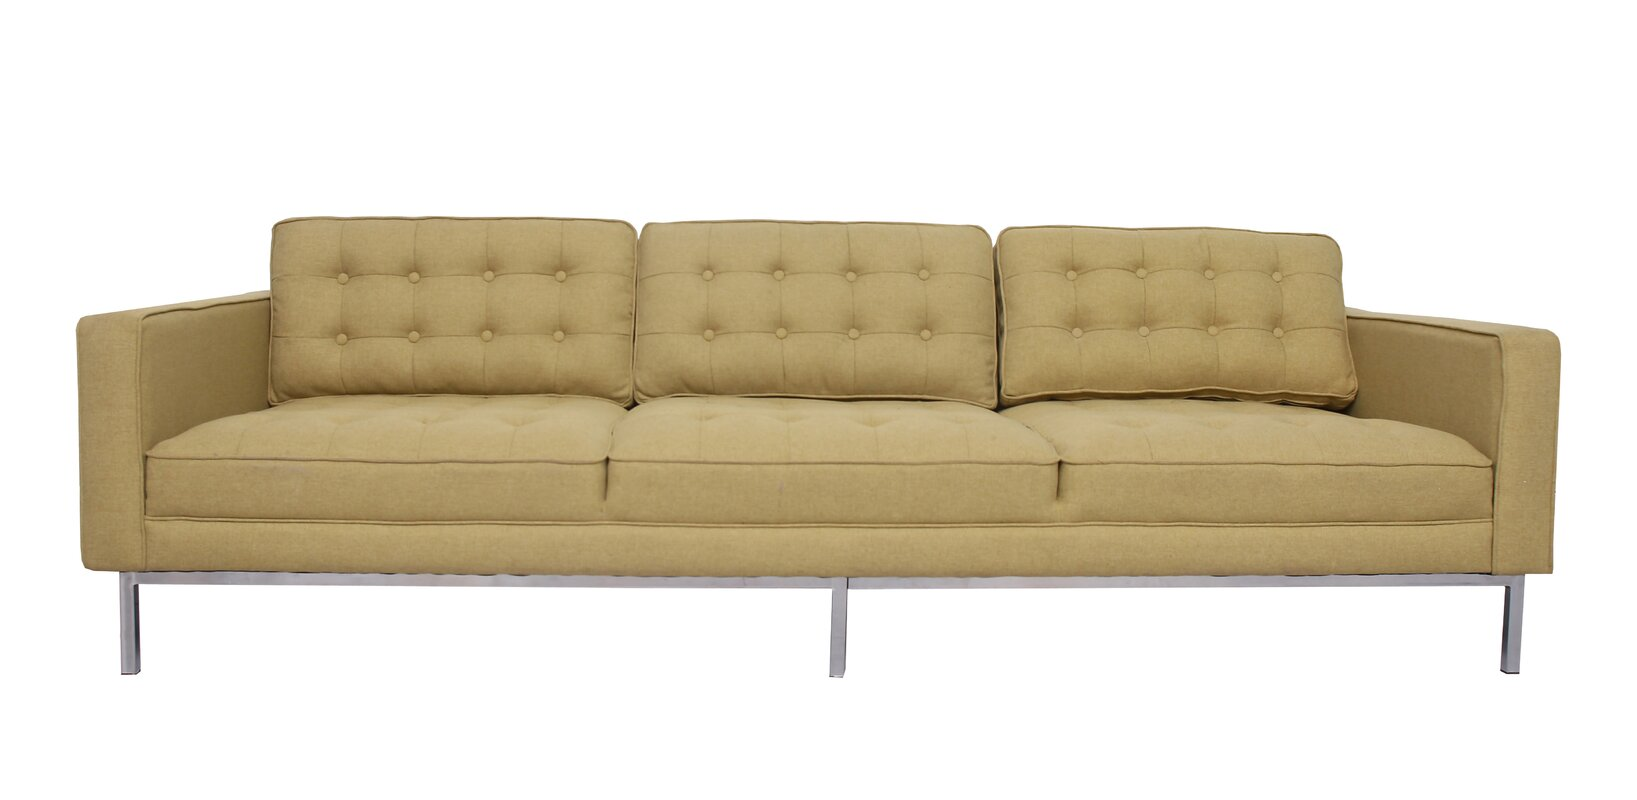 Draper Linen Modern Contemporary Button Tufted Sofa